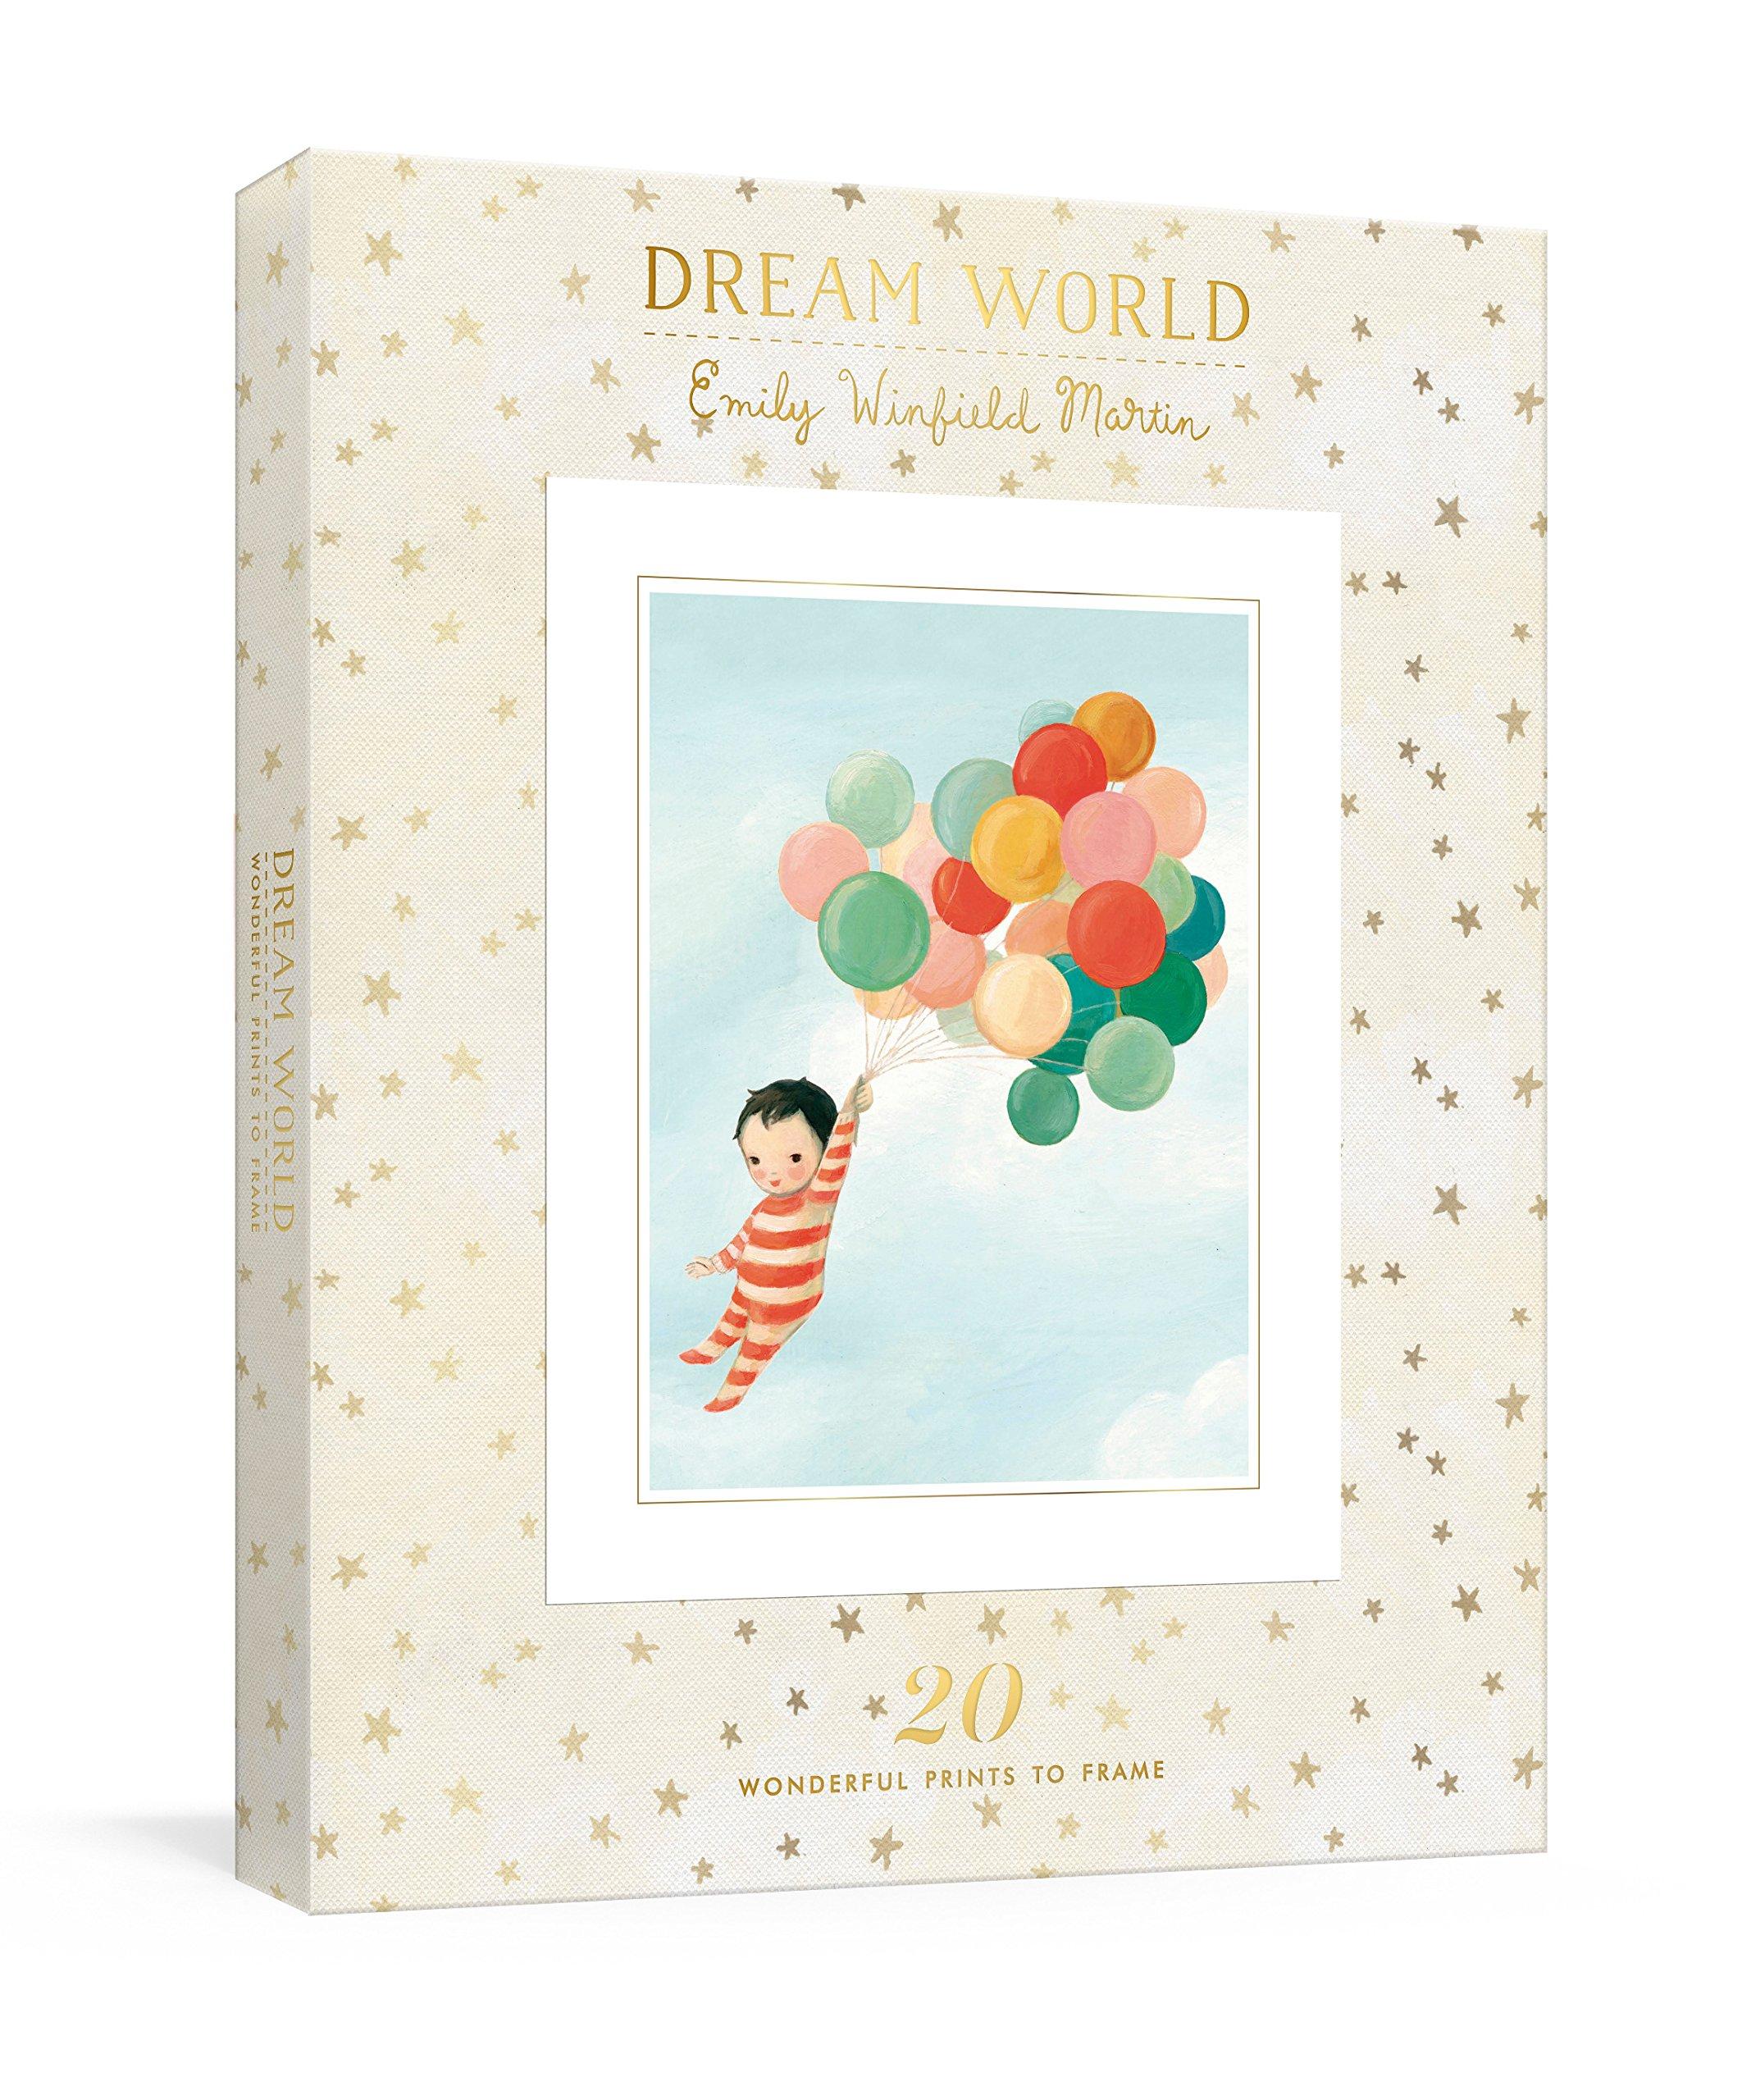 Amazon.com: Dream World: 20 Wonderful Prints to Frame (9780525574590 ...